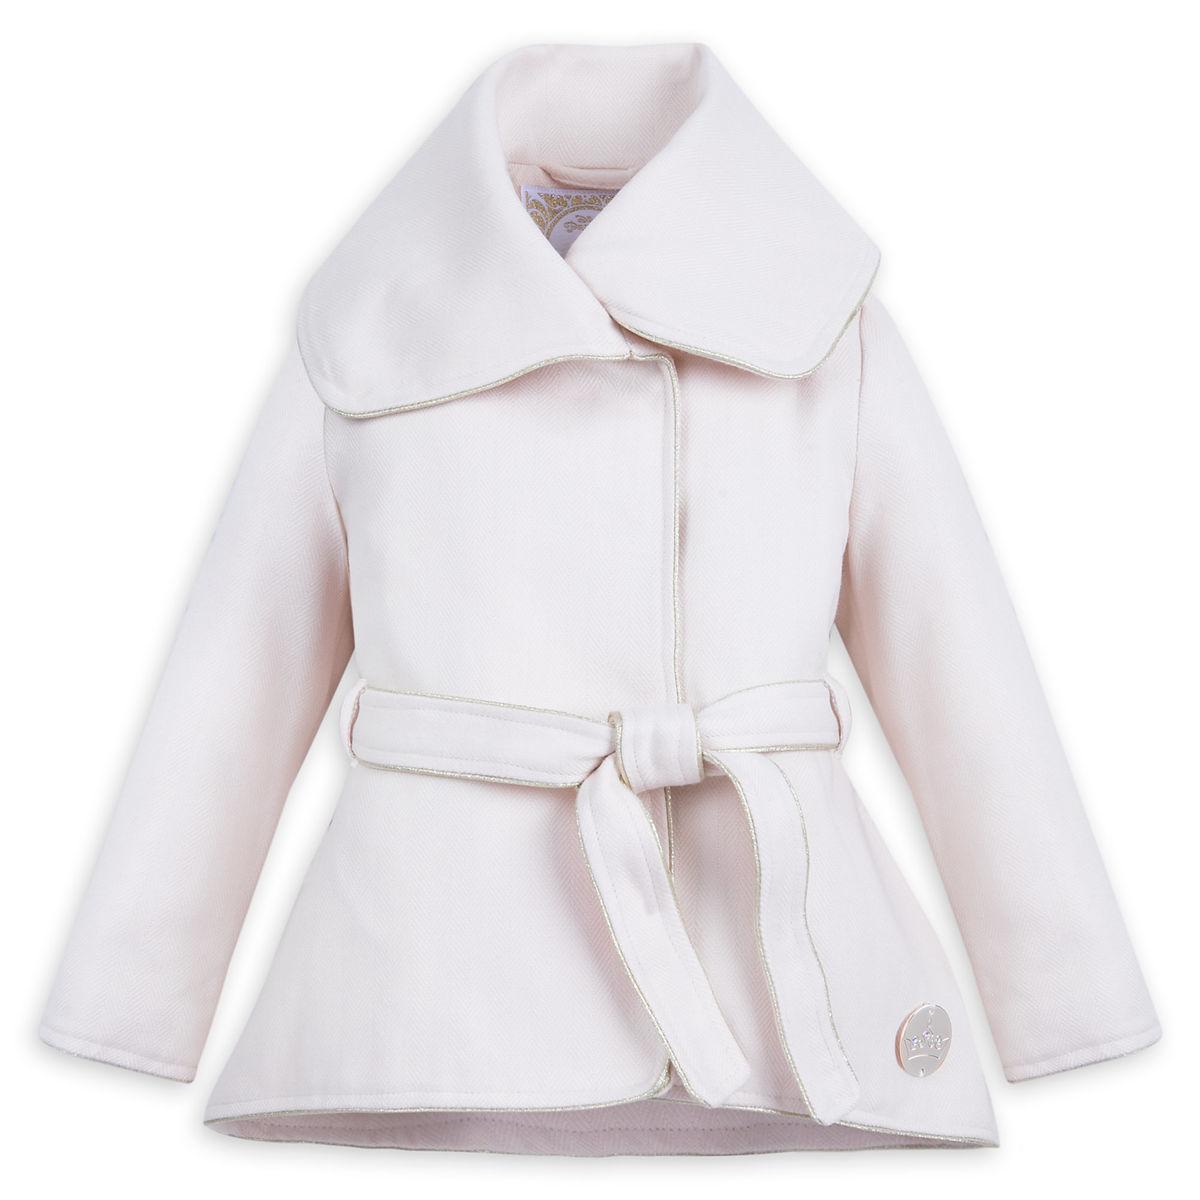 b10765e54e Product Image of Disney Princess Tweed Coat for Girls   1